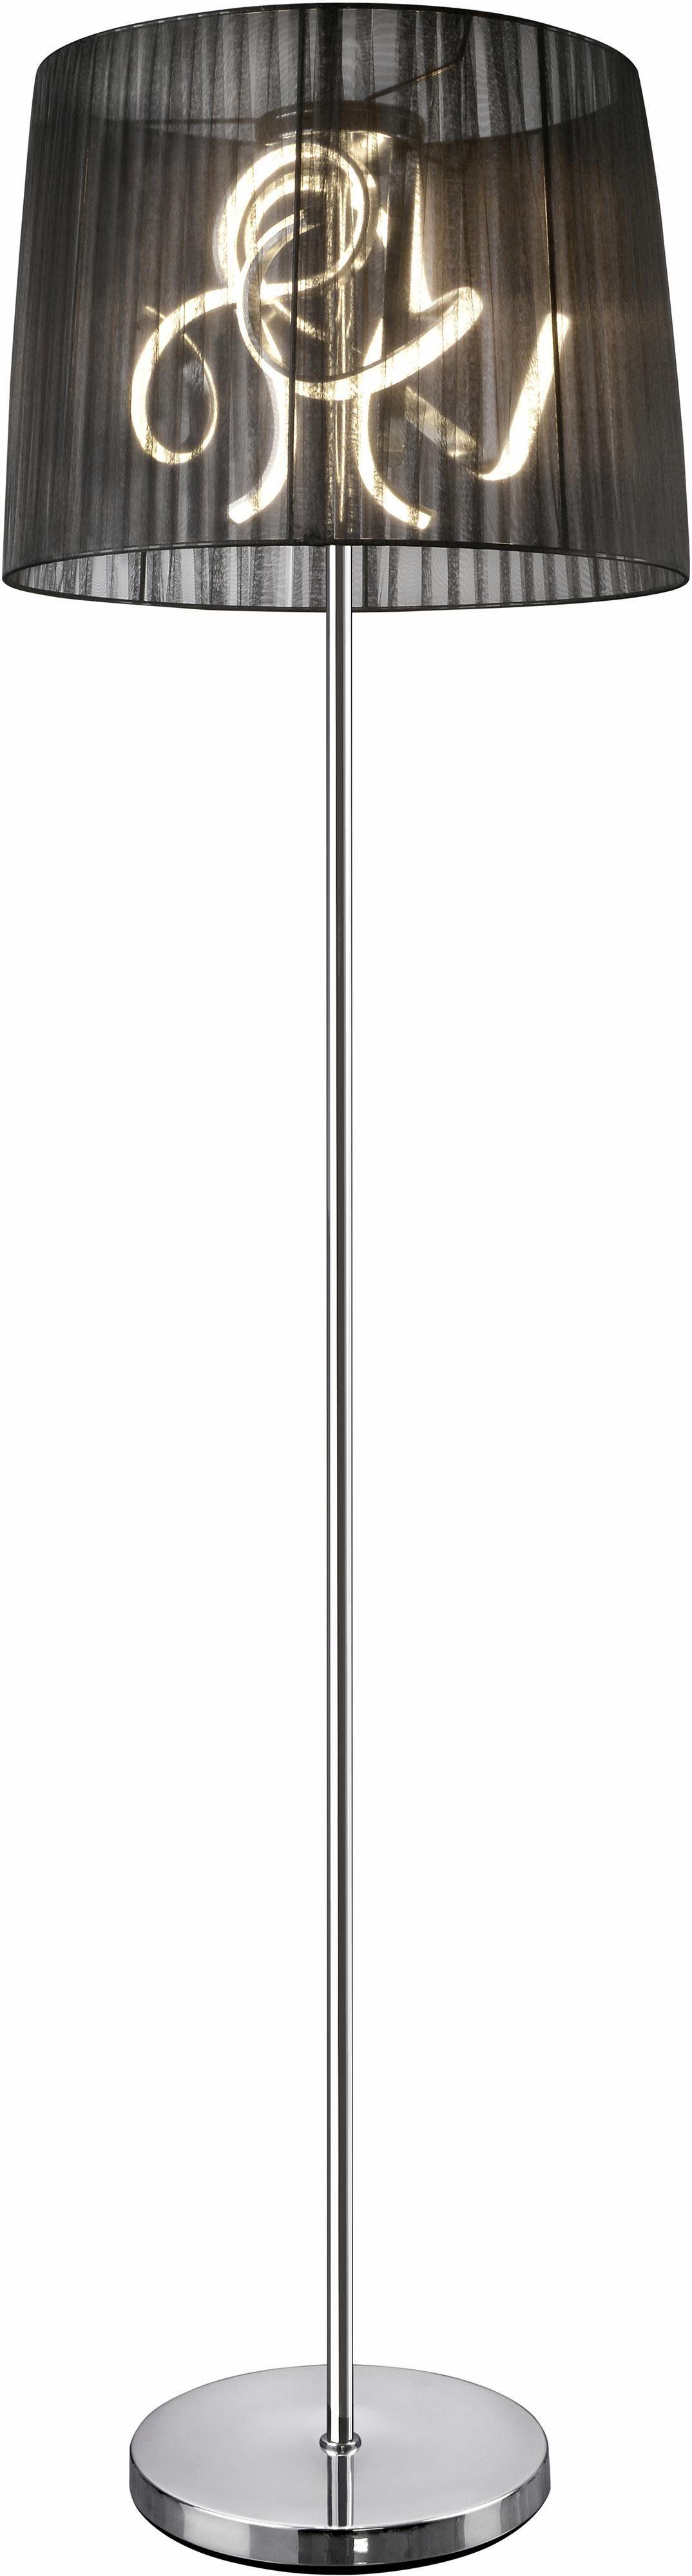 SOMPEX LED Stehlampe »Organza«